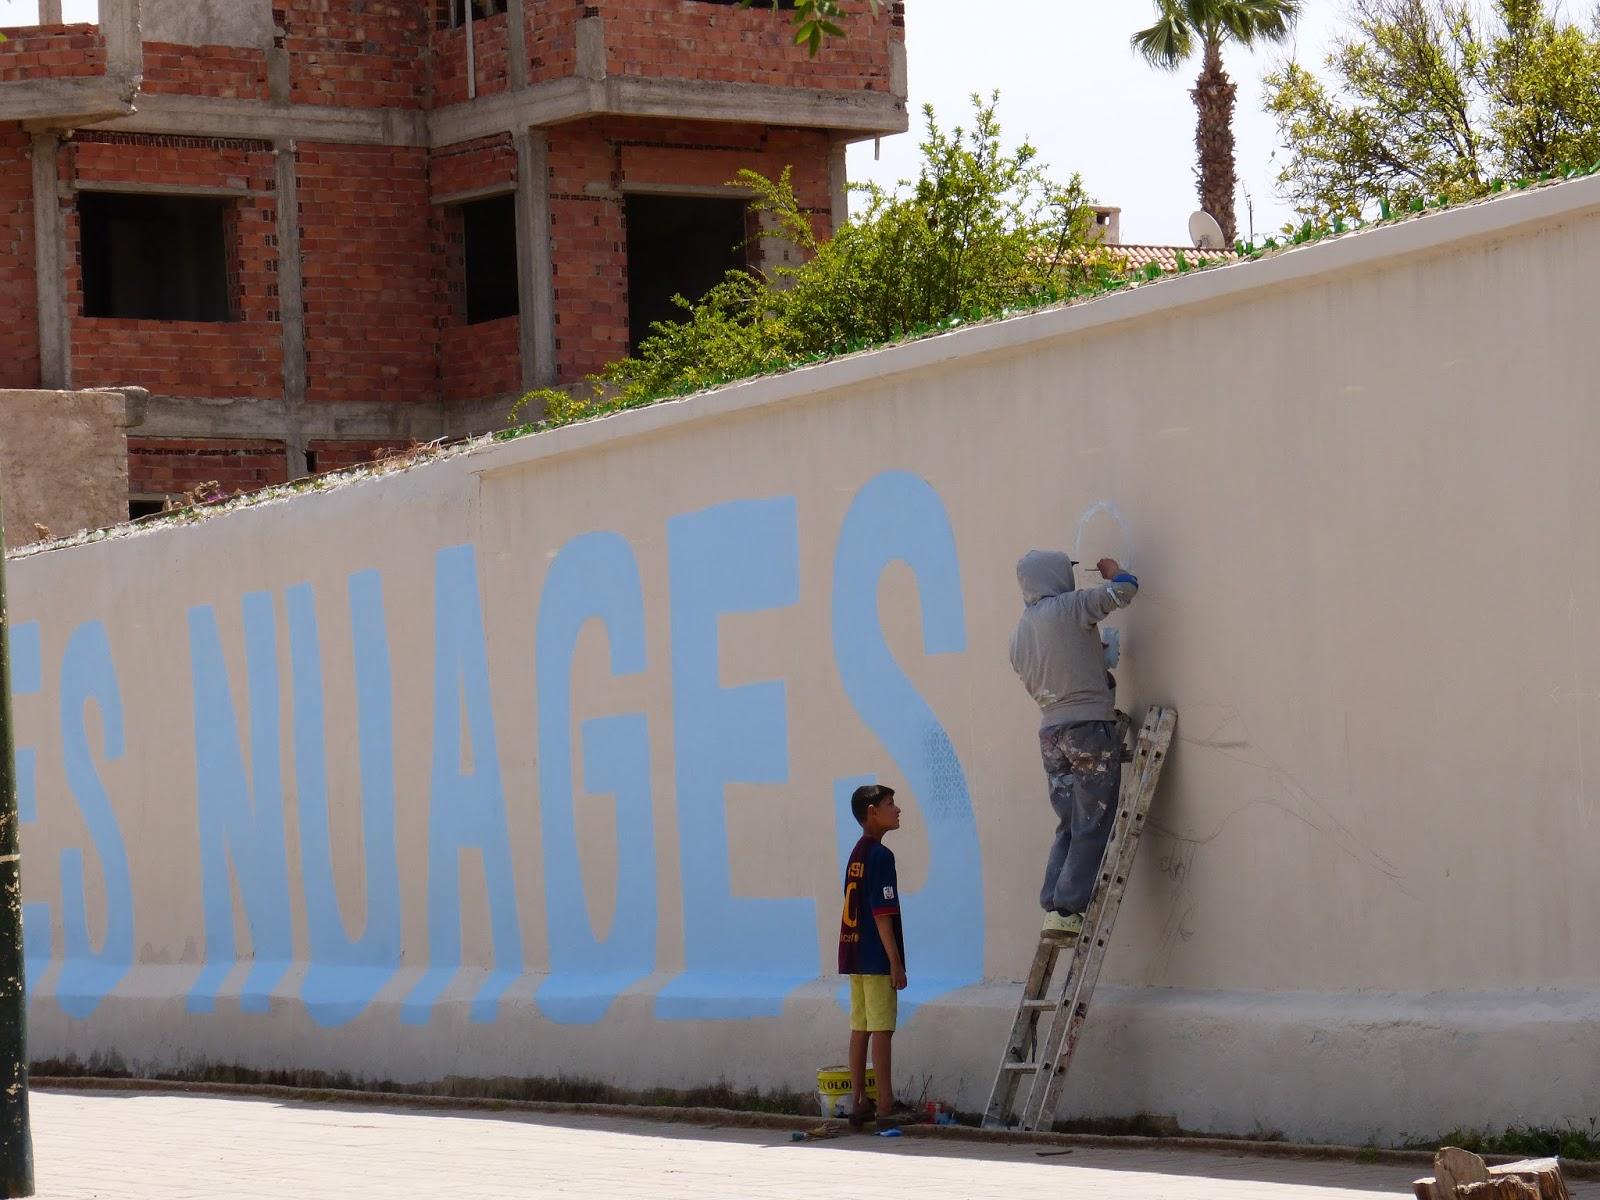 Biennale internationale d 39 art mural for Ecole d art mural